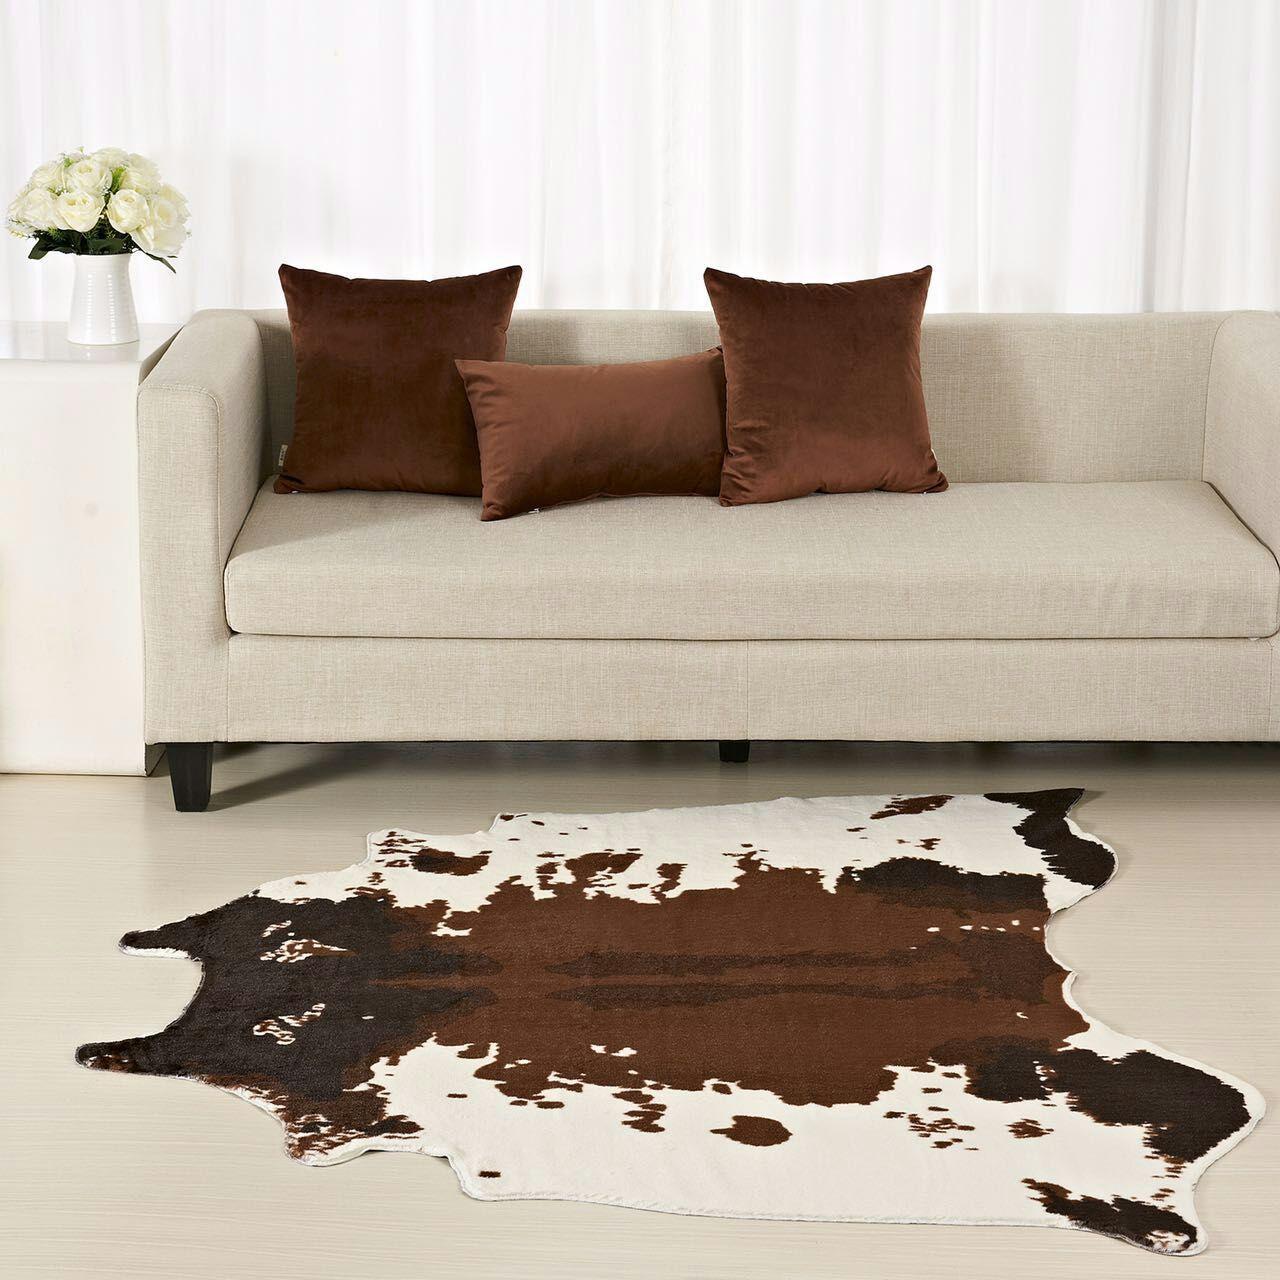 Brown Cowhide Rug Zebra Carpet Creative 150*130 Cm Home Decoration Faux Skin Mat For Living Room Bedroom Carpets